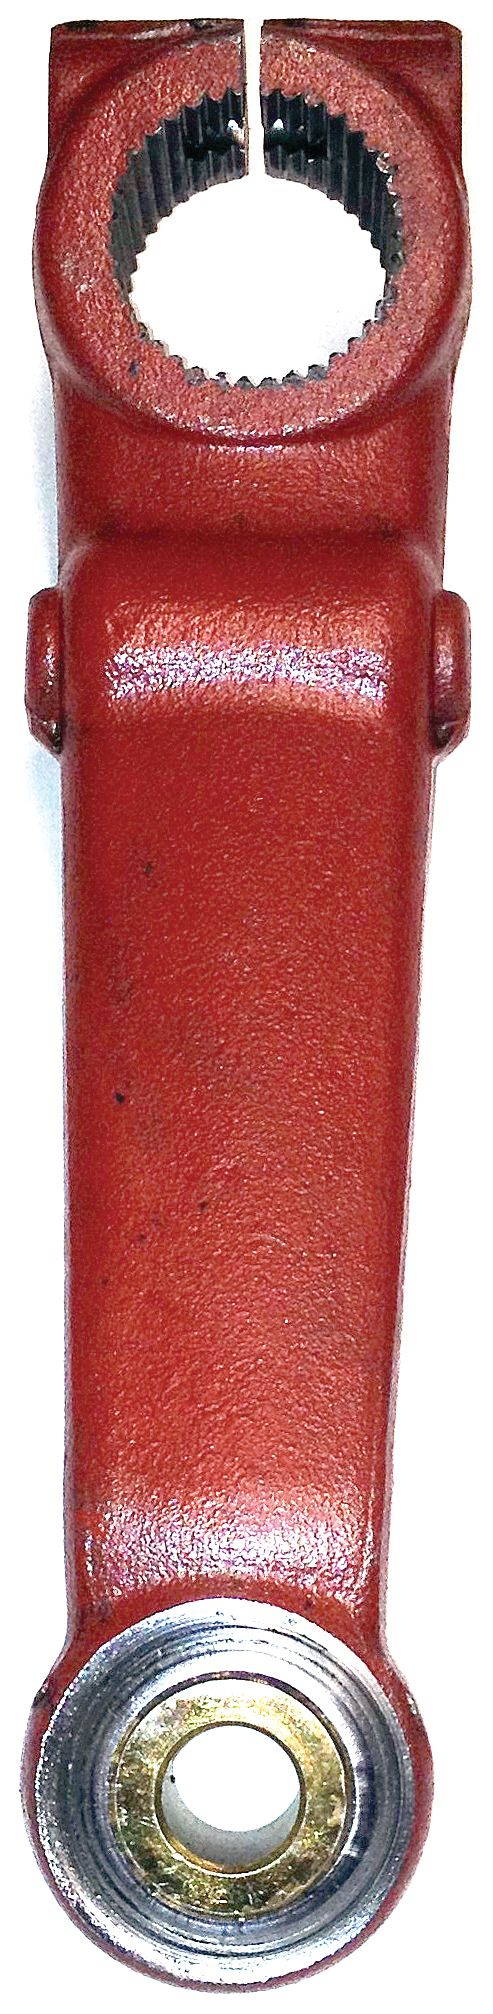 UNIVERSAL TRACTORS LIFT ARM (RH) 67286